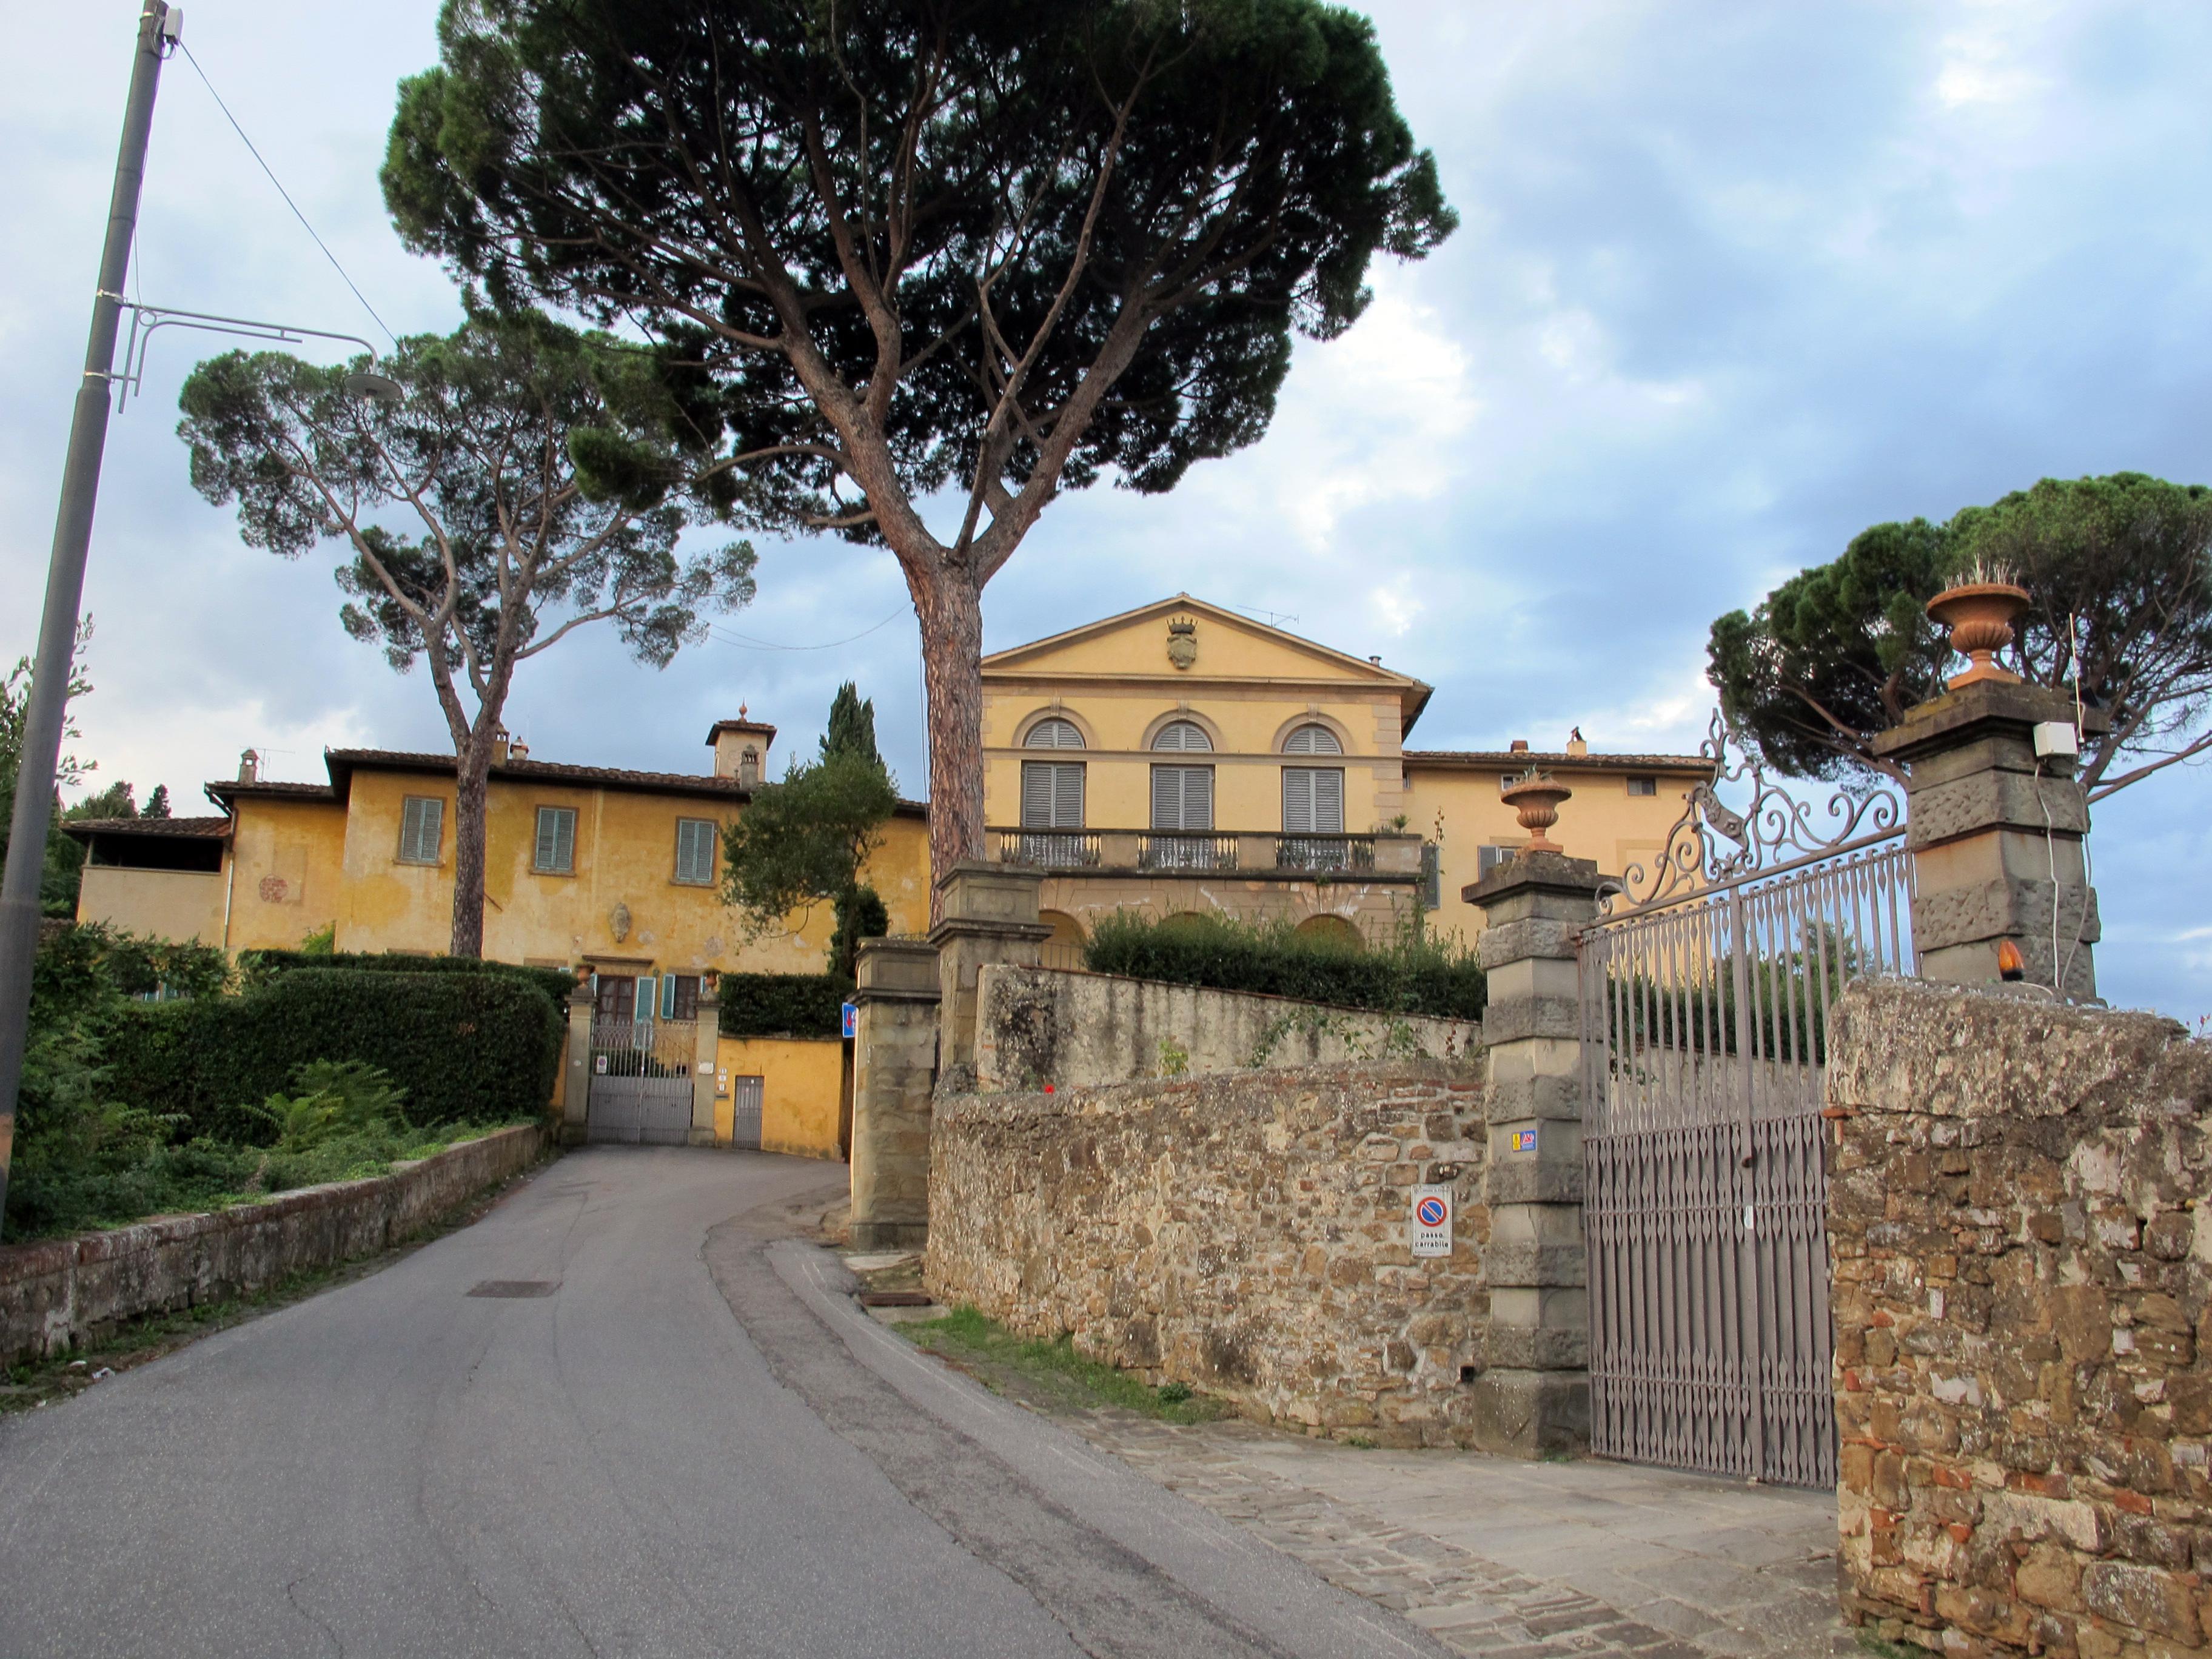 Villa Di Bellosguardo Firenze